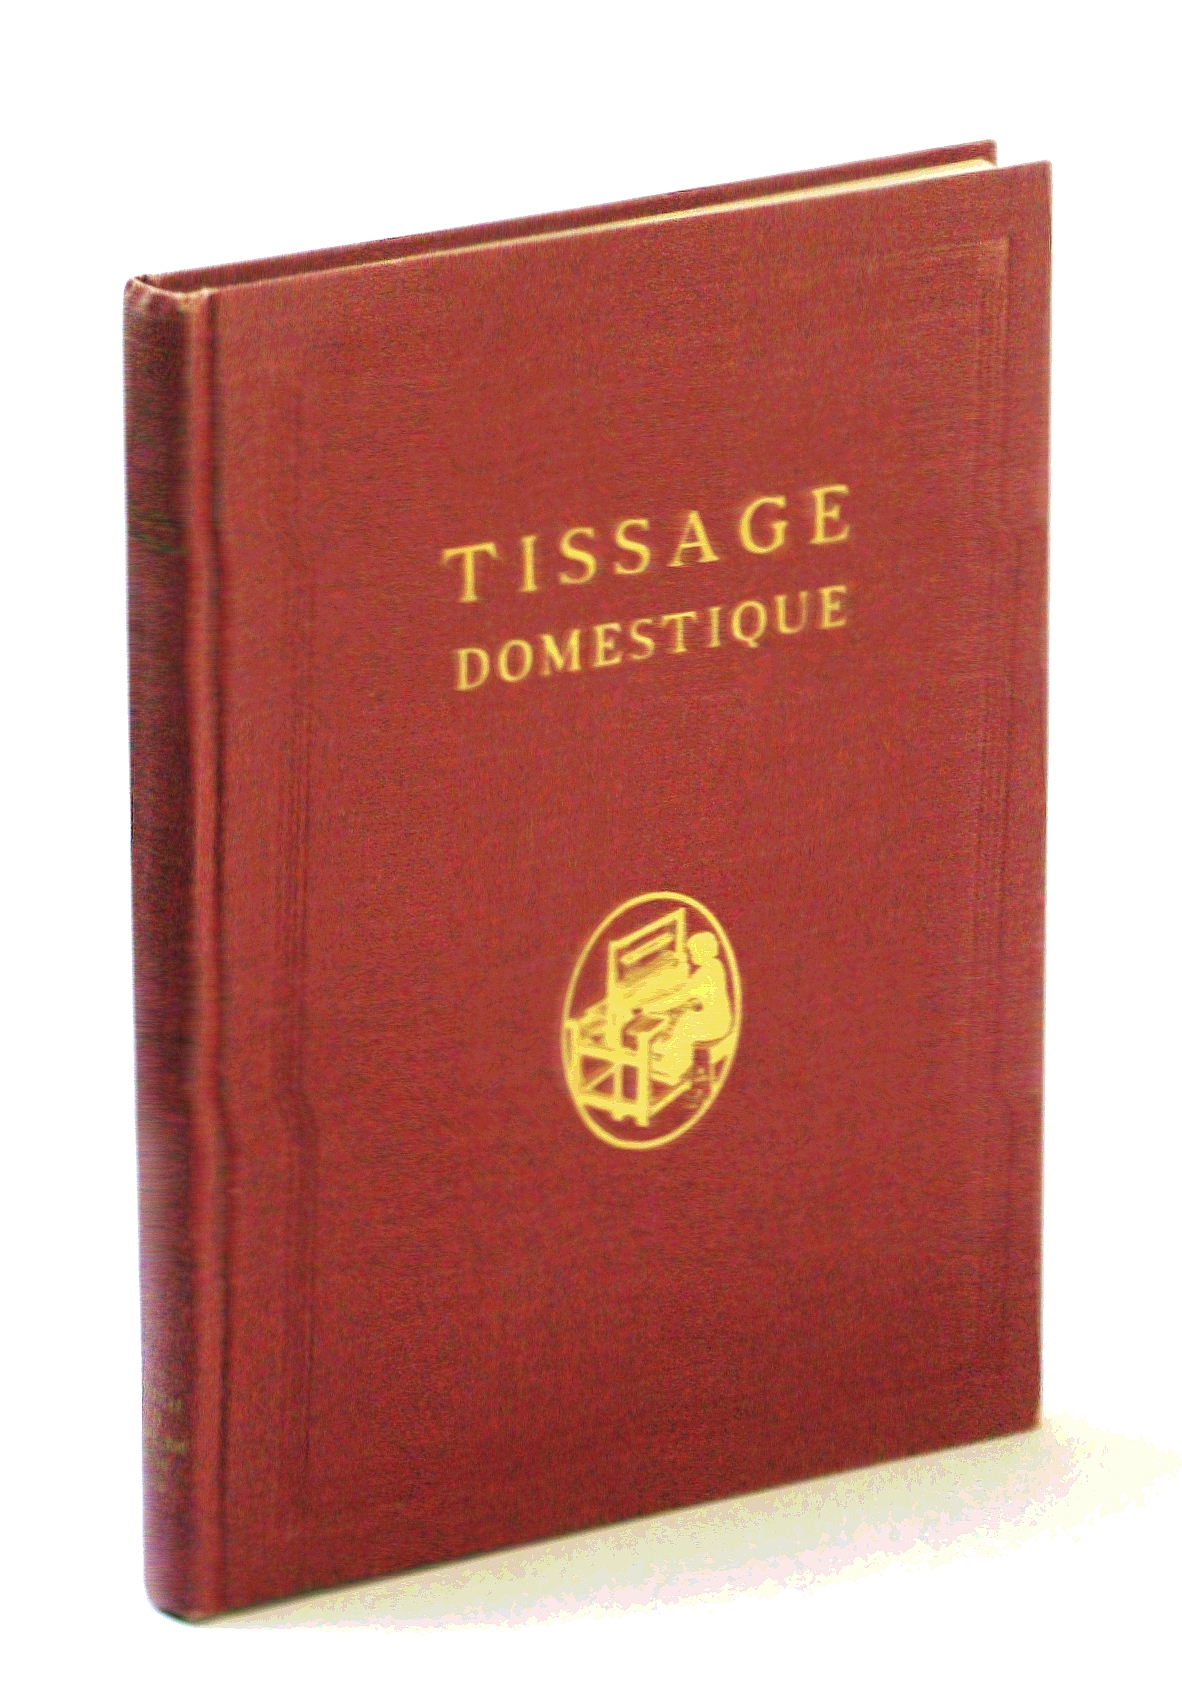 Tissage Domestique